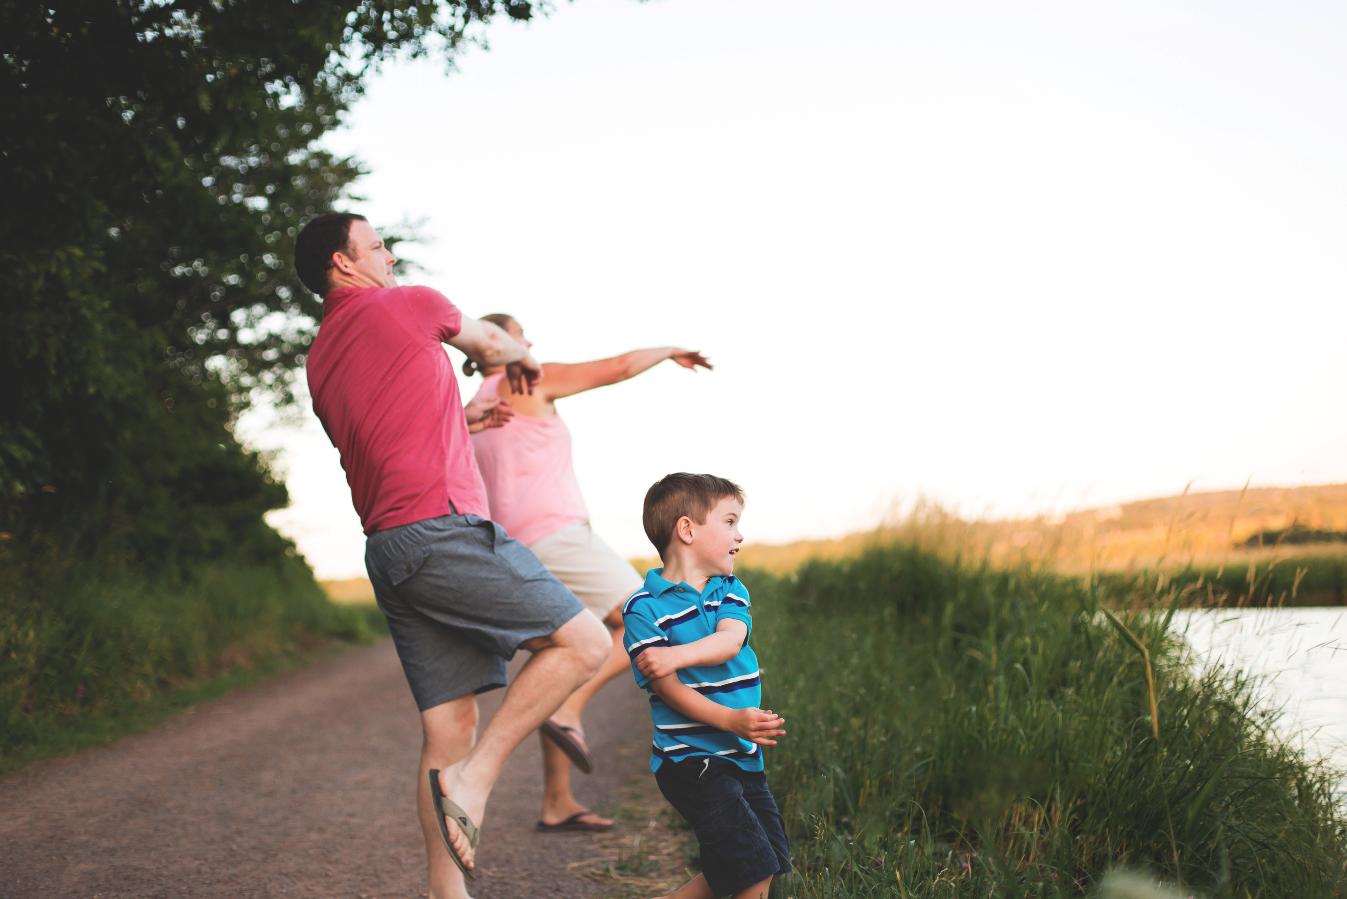 Hamilton-Toronto-Burlington-Oakville-welland-Niagara-Cambridge-Dundas-Ontario-Family-photographer-photography-Moments-by-Lauren-Nova-Scotia-Antigonish-Lifestyle-Session-Image-Photo-3.png